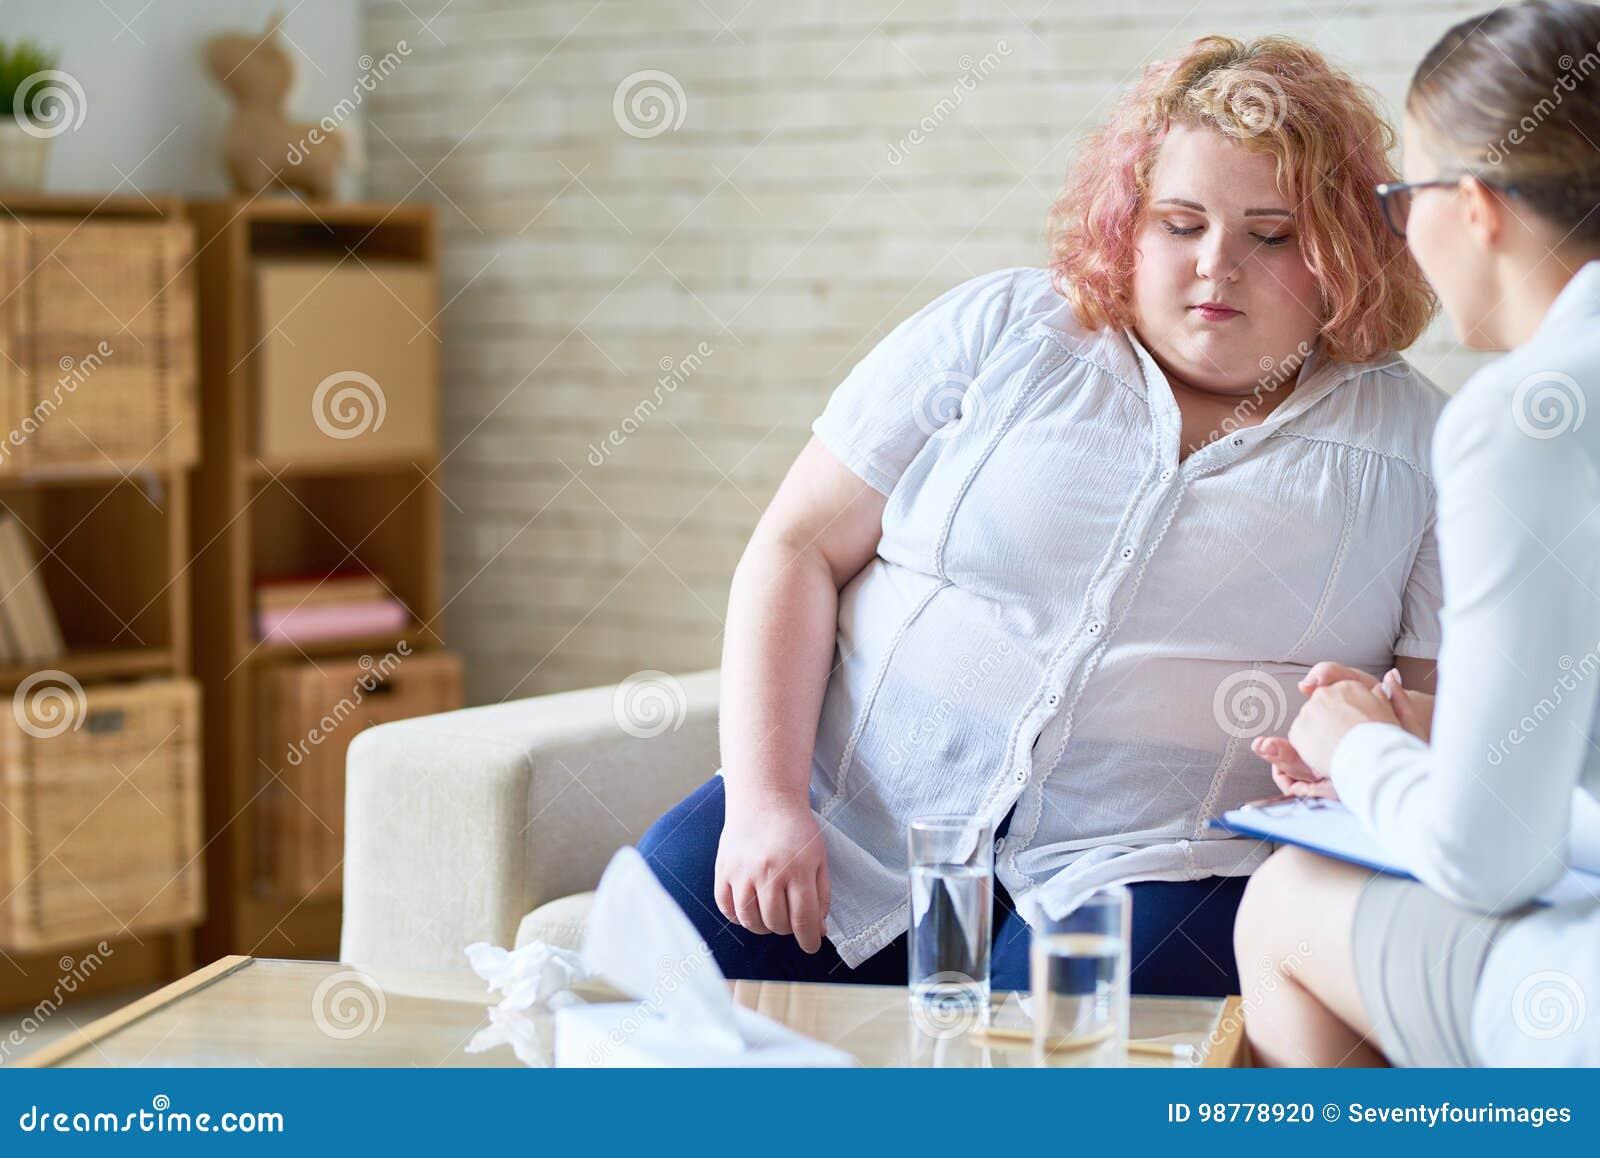 jeune femme obese